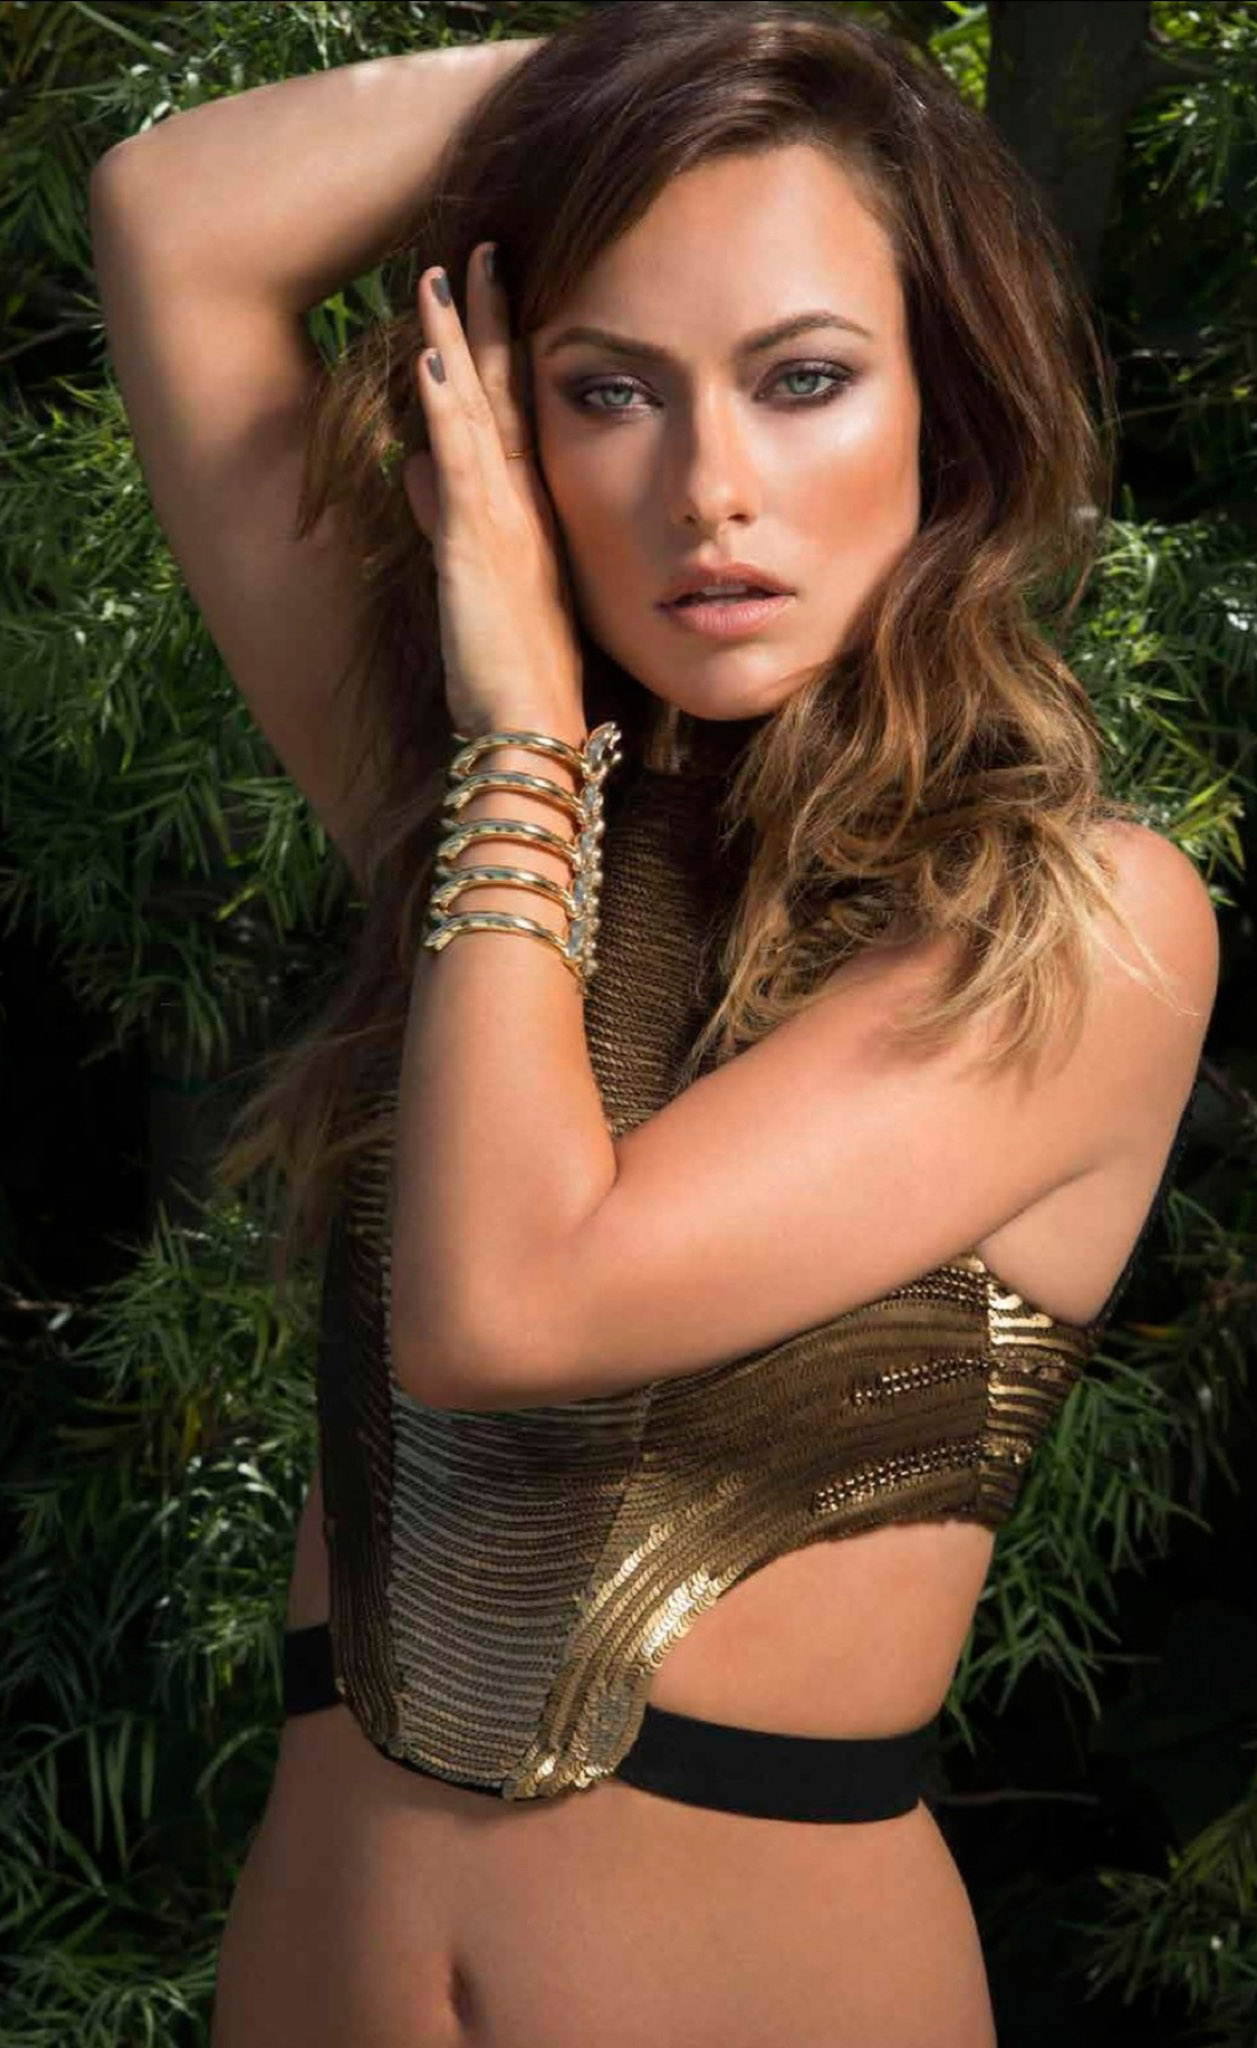 olivia wilde actress bikini harpers leg height weight bazaar bio age wiki emma body measurements pop